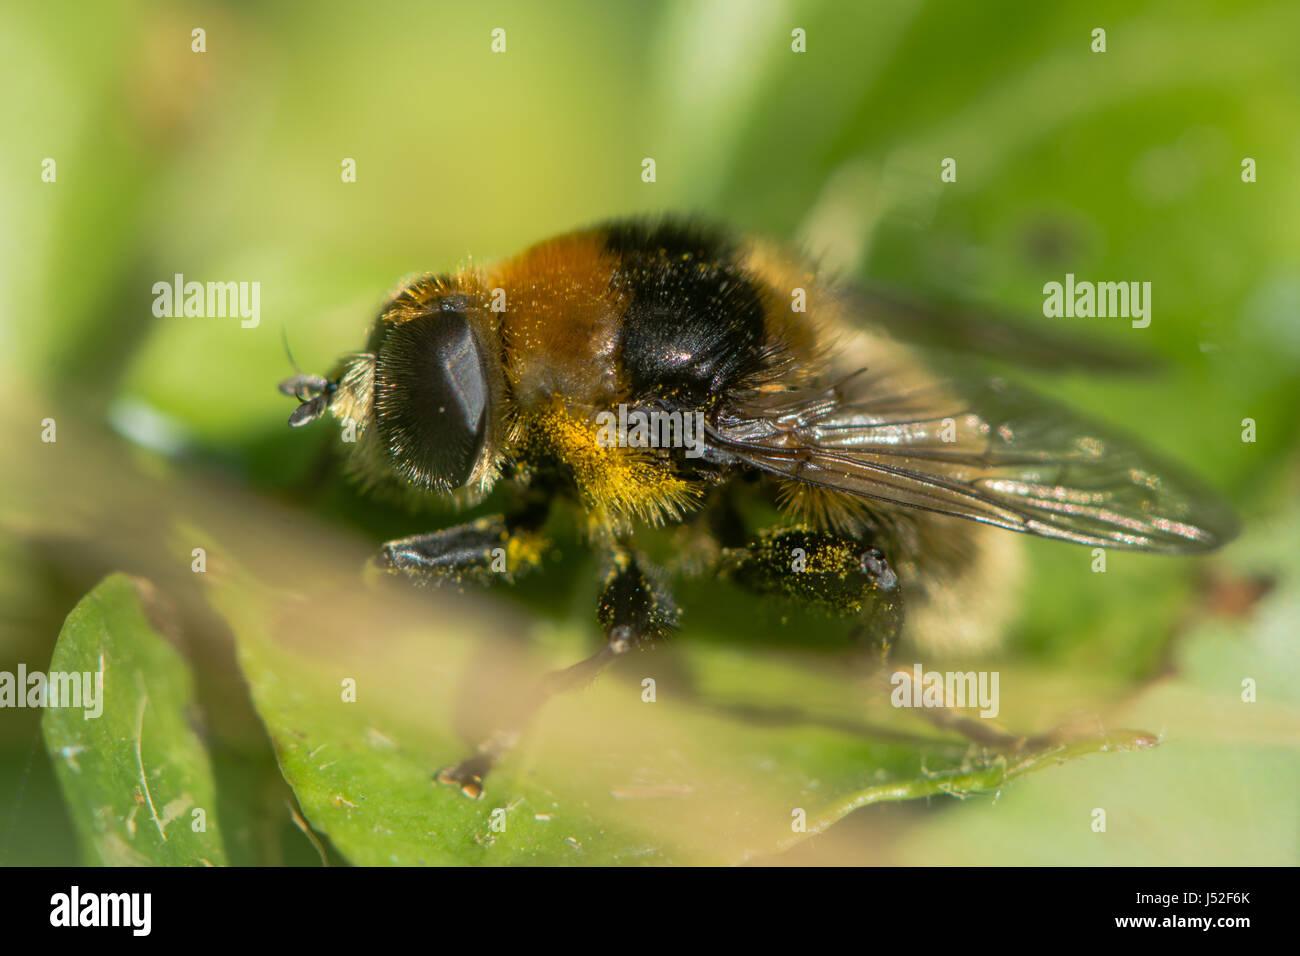 Narcissus Bulb Fly (Merodon equestris). Hairy bumblebee mimic in the family Syrphidae, subfamily Merodontini, aka Stock Photo